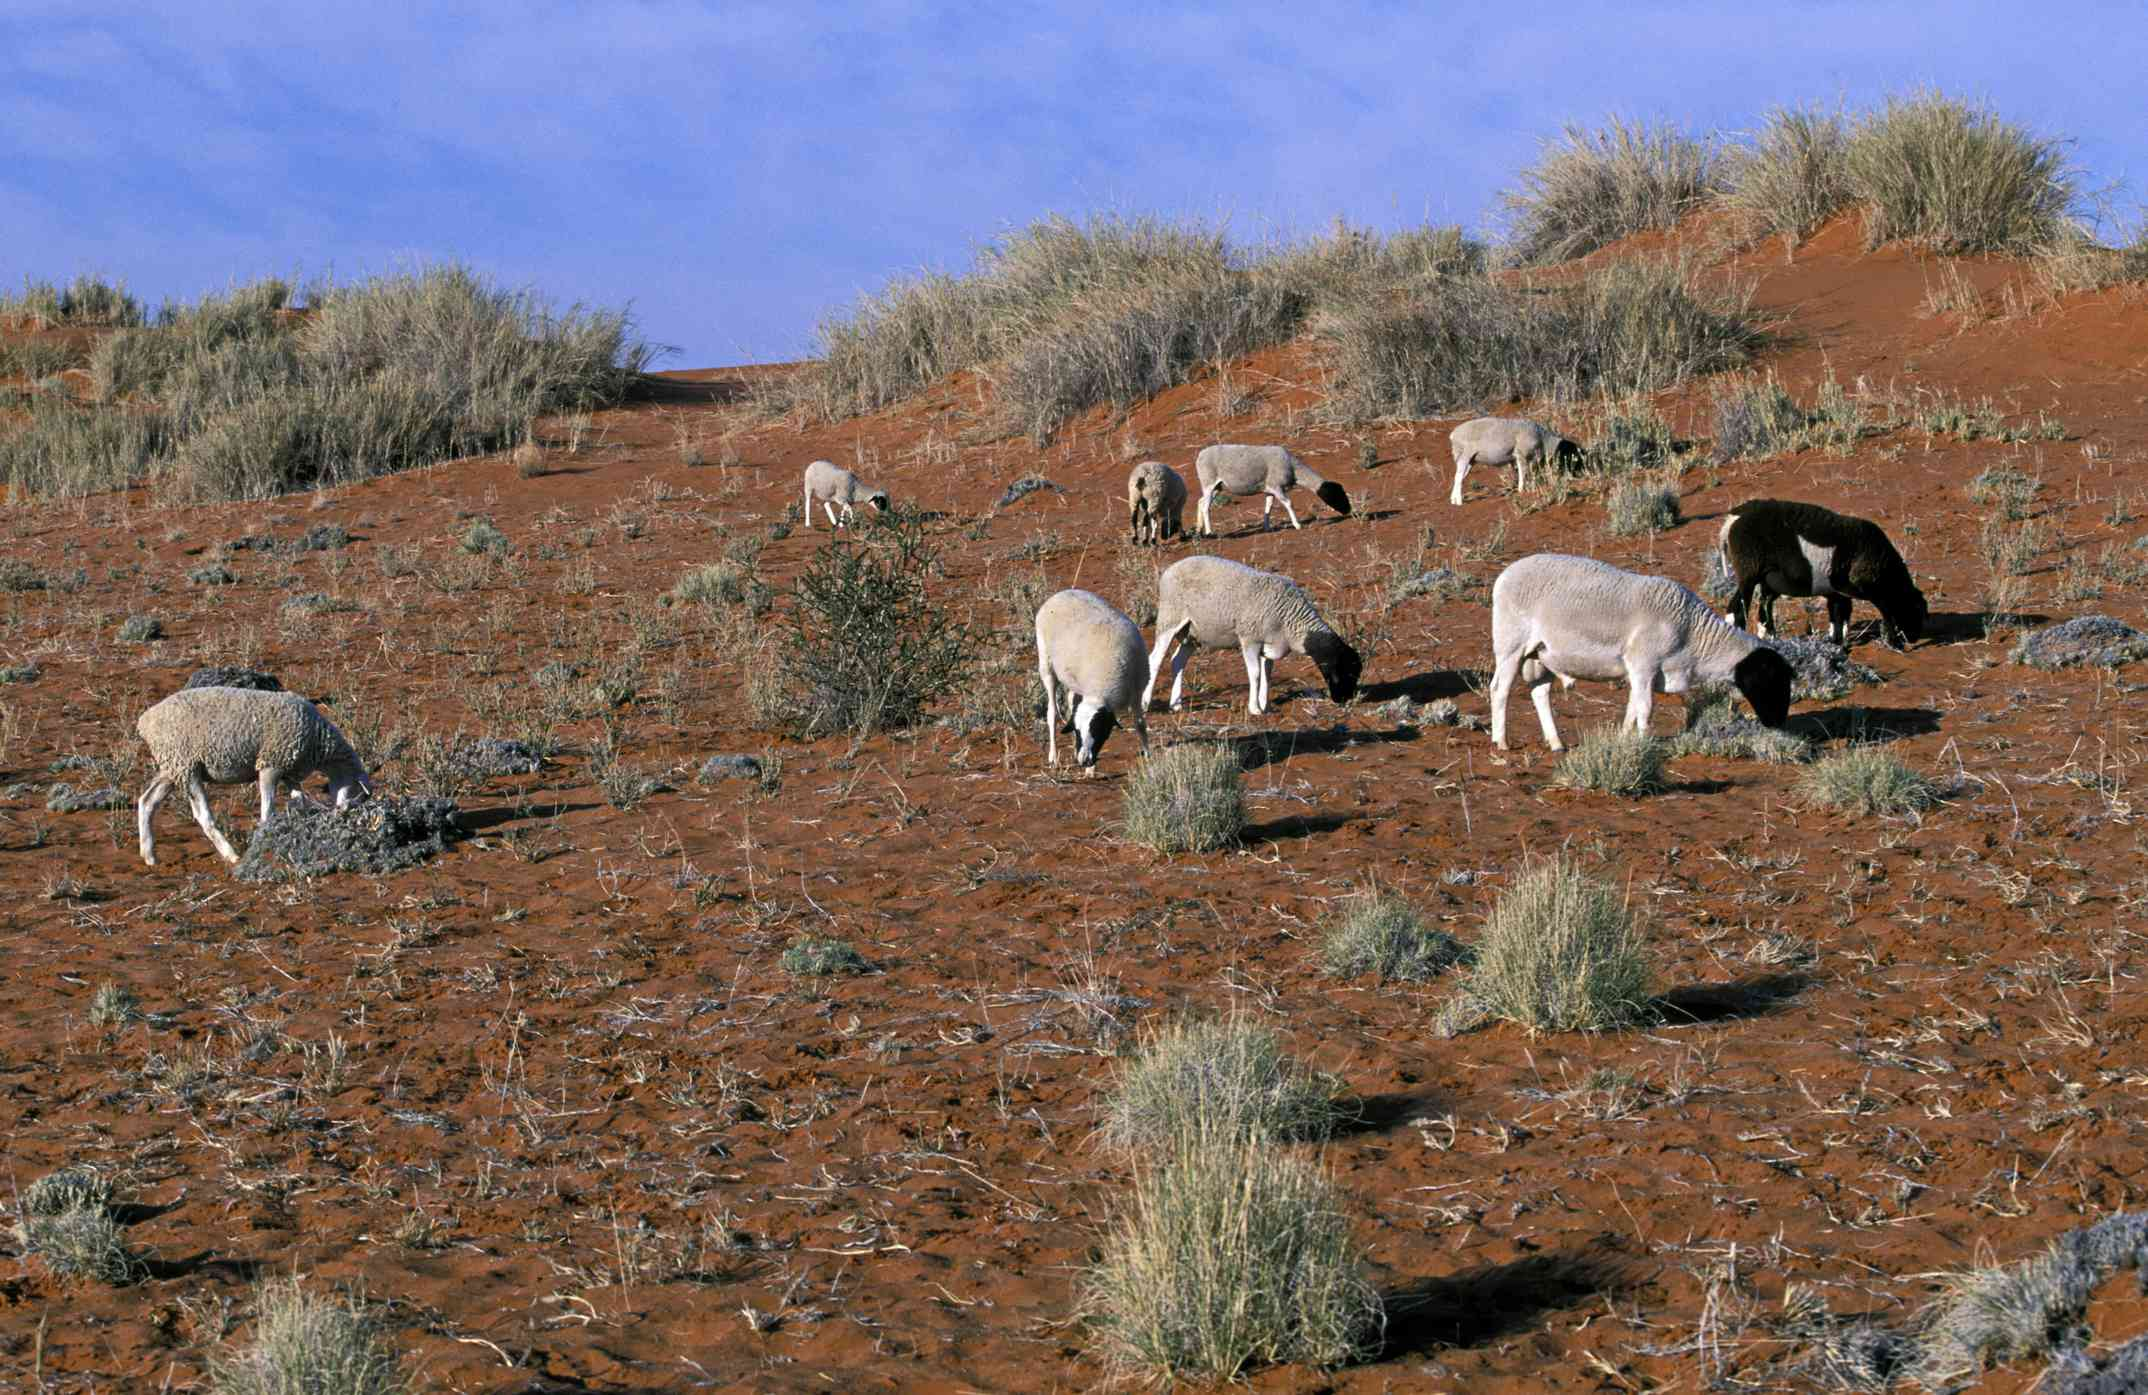 Livestock overgrazing in an African field.